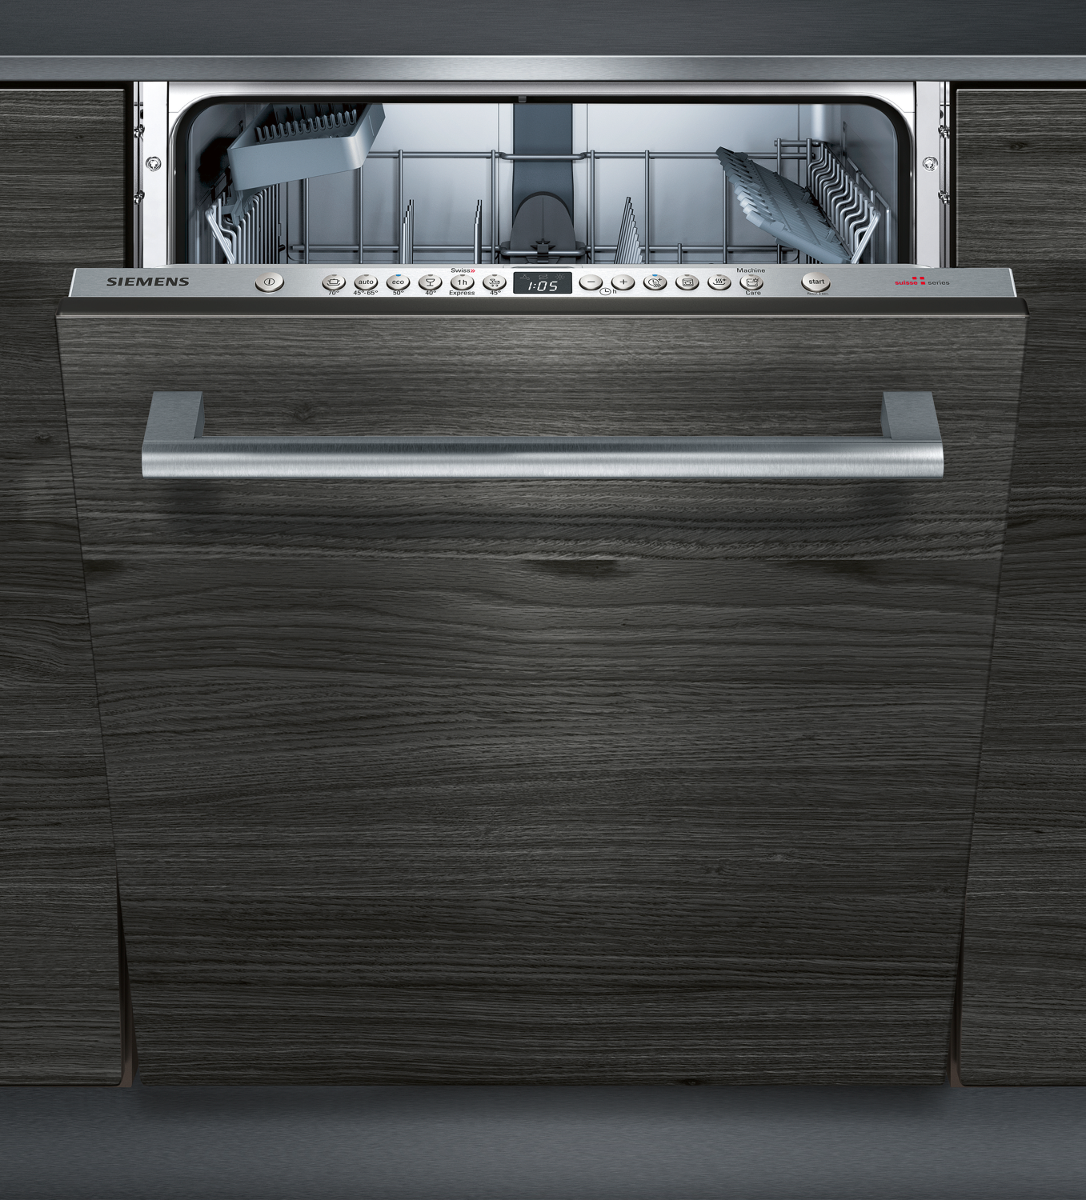 siemens sn736x01ih vollintegrierter geschirrsp ler kapazit t 13 massgedecke edelstahl. Black Bedroom Furniture Sets. Home Design Ideas